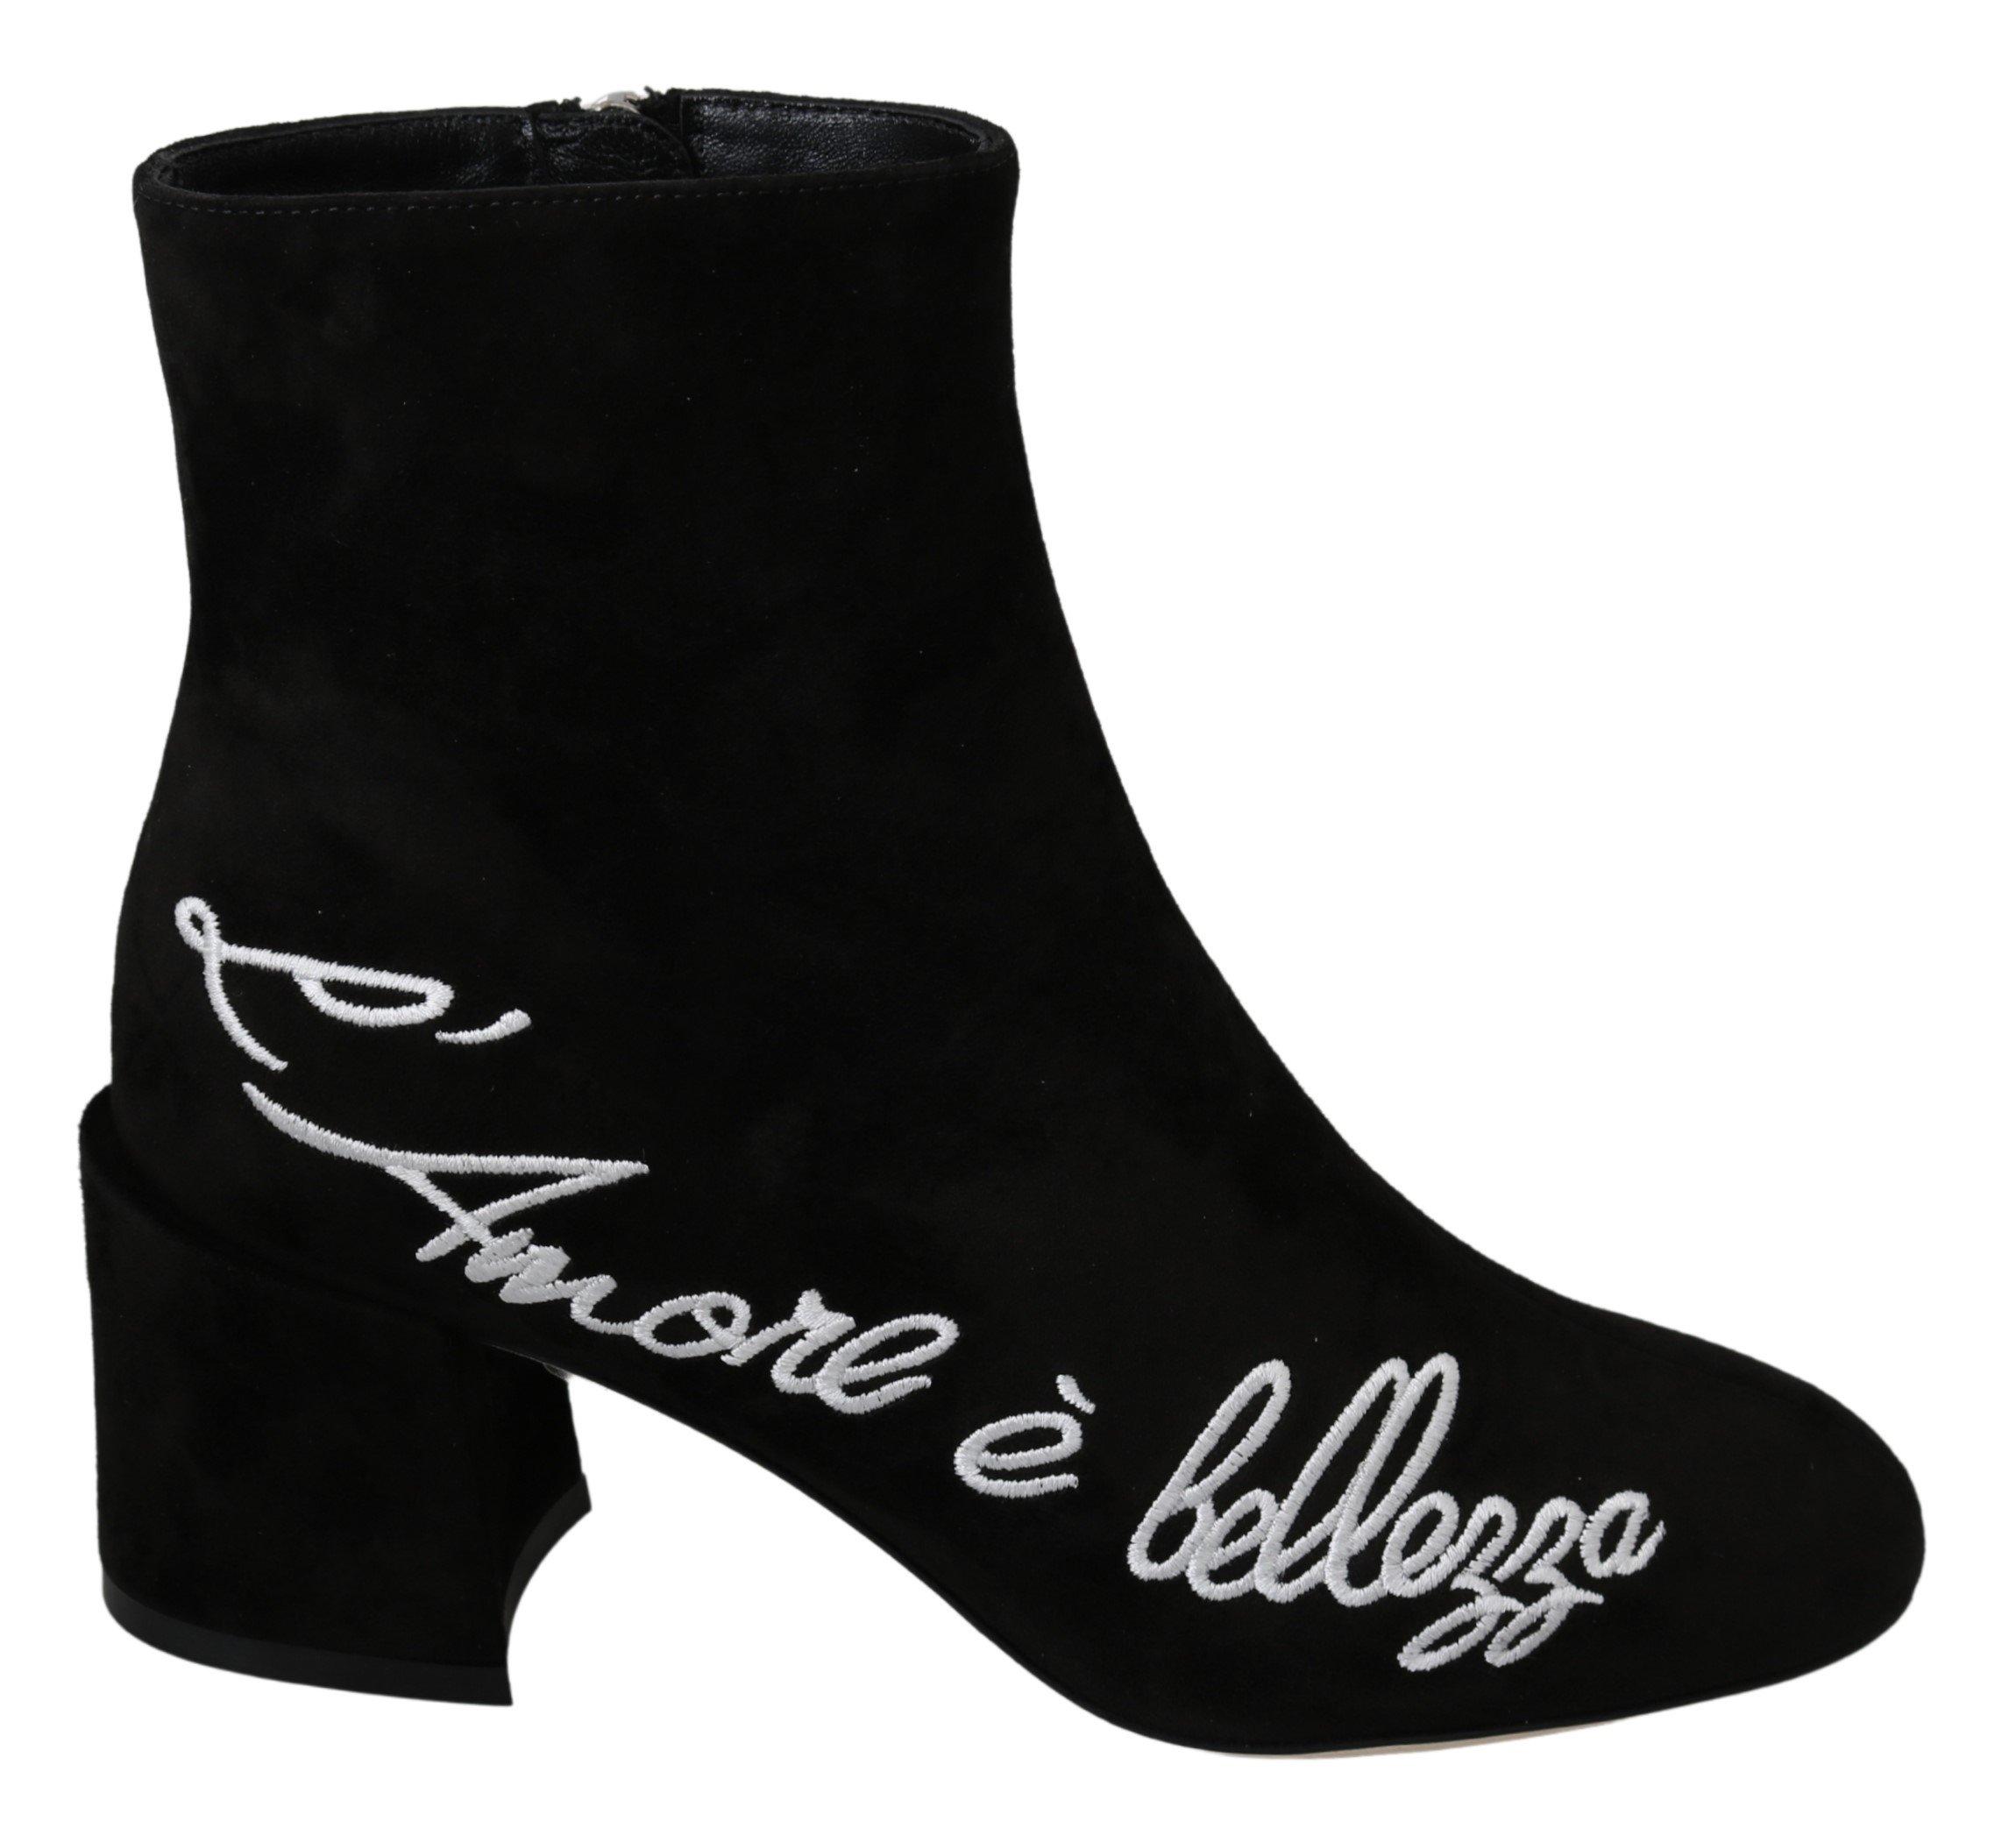 Dolce & Gabbana Women's Suede L'Amore E'Bellezza Boot Black LA7048 - EU35/US4.5